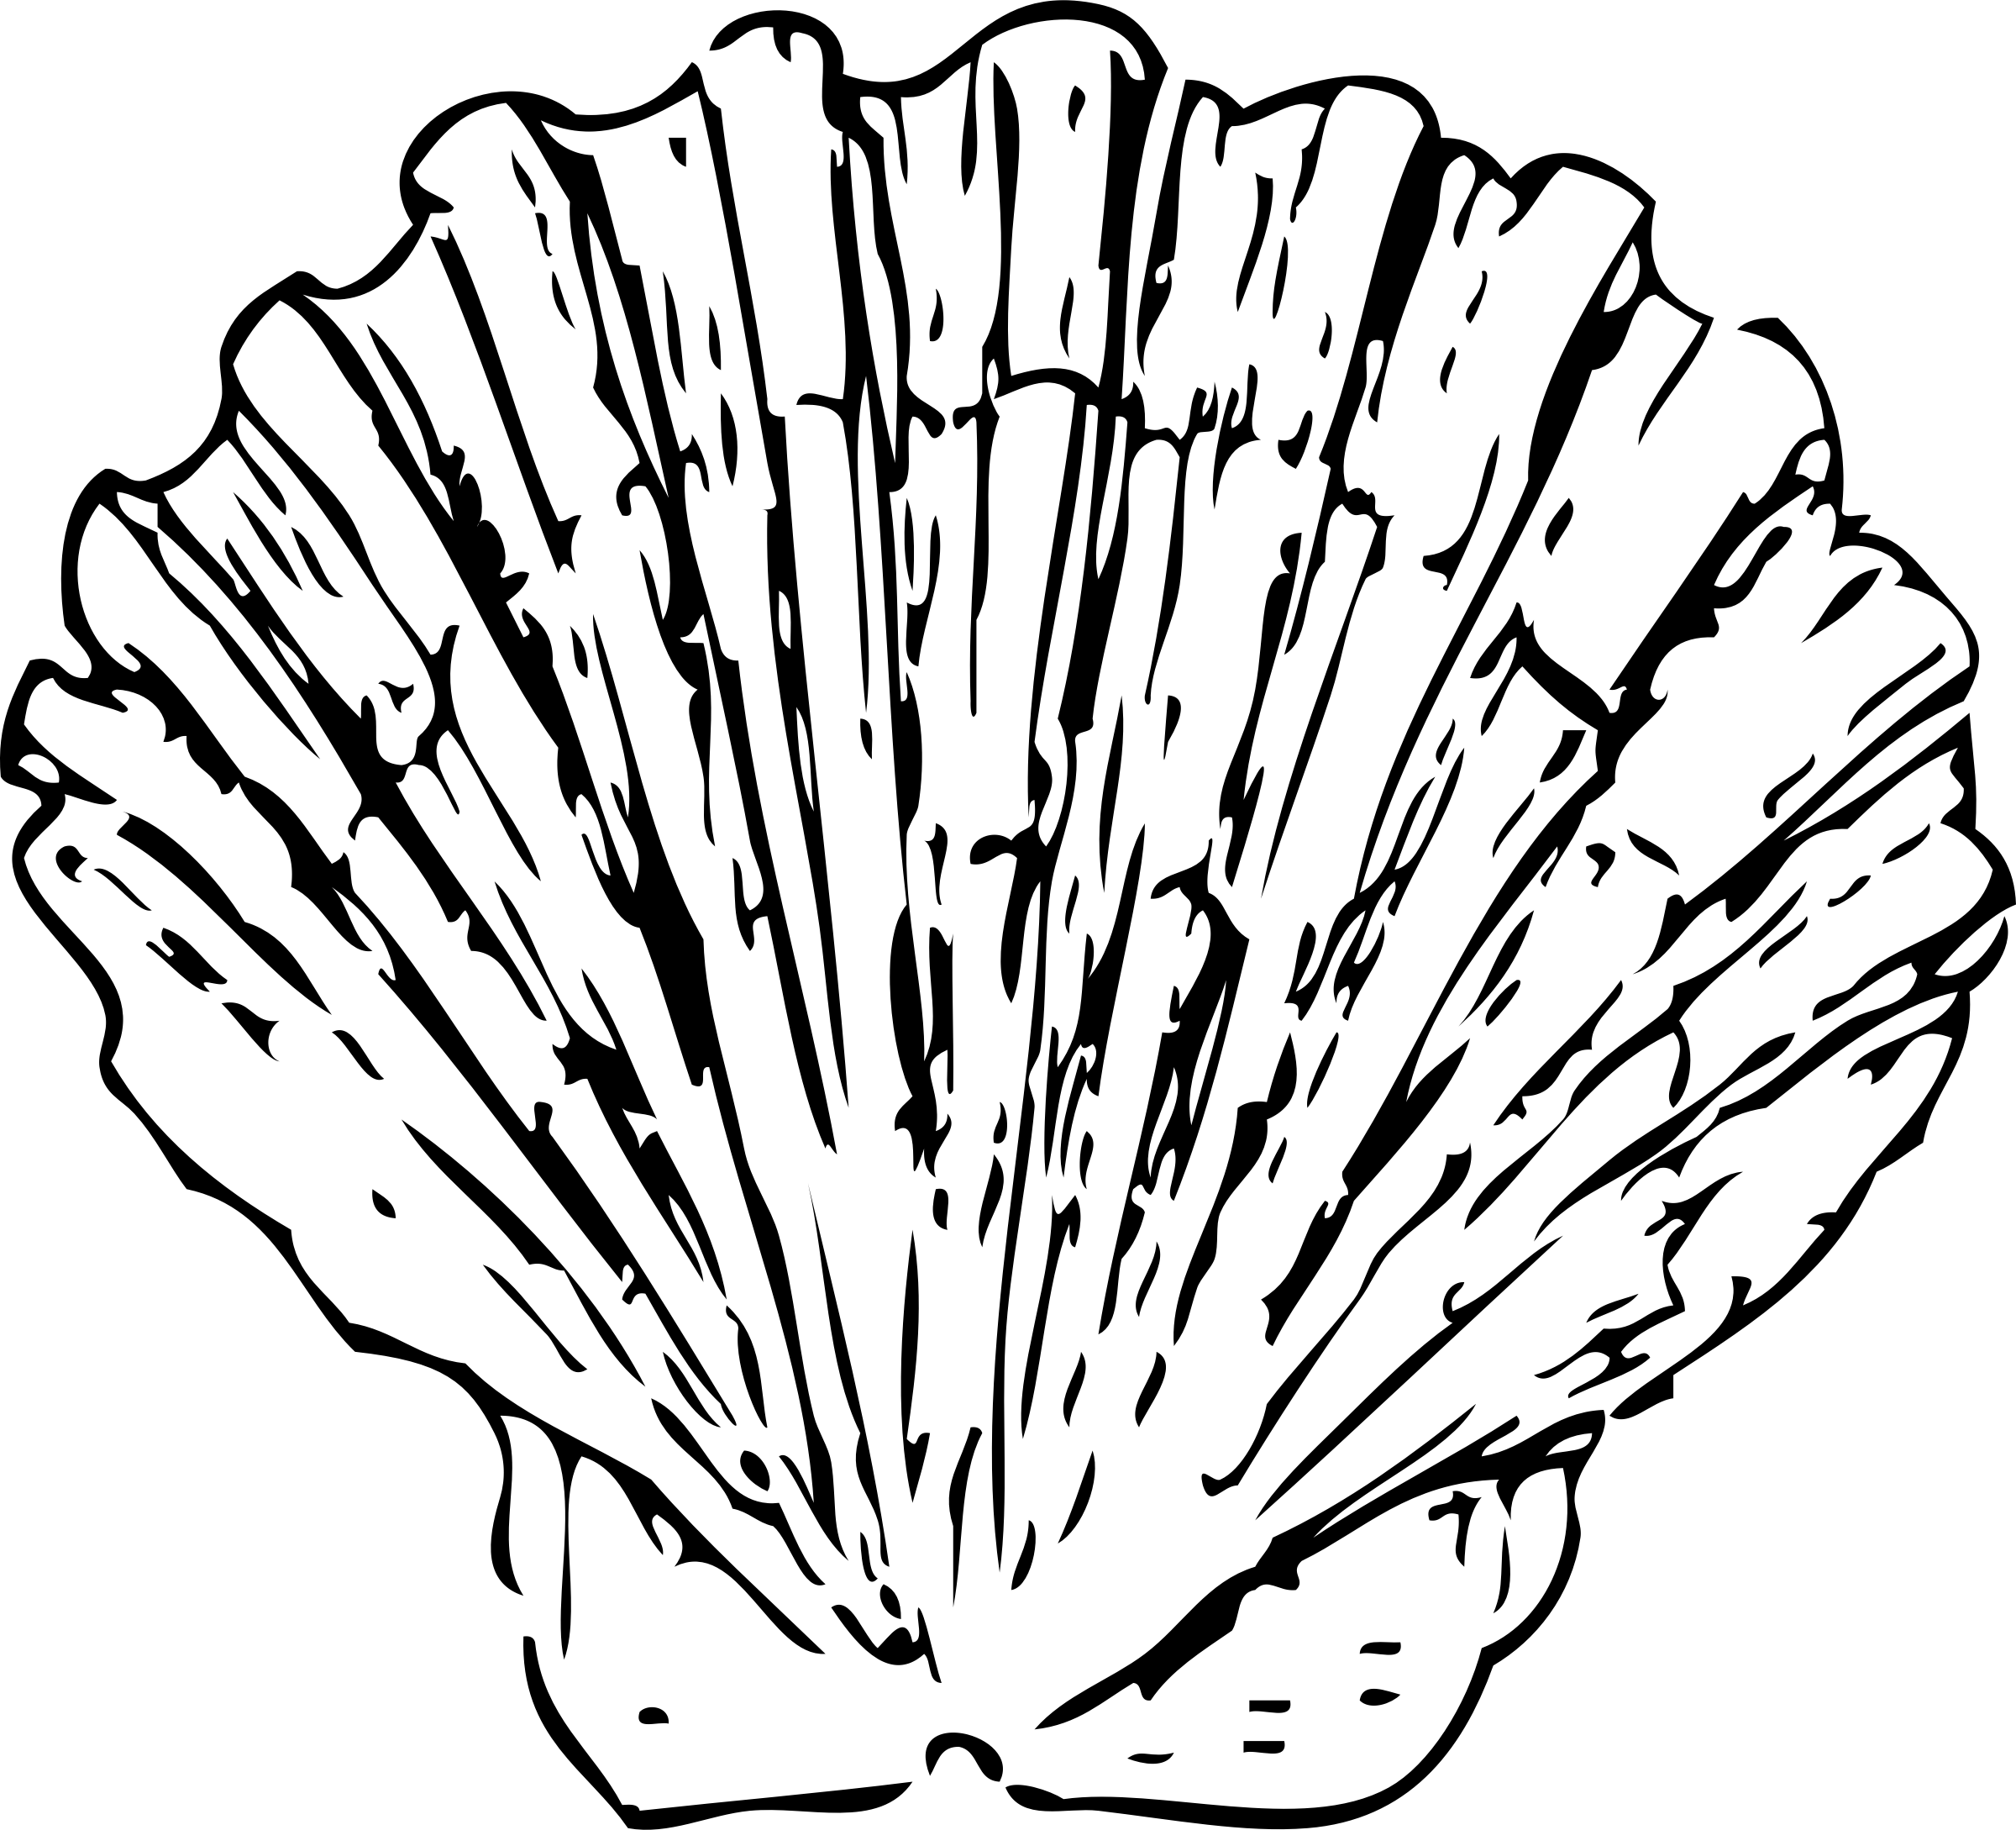 graphic Clipart